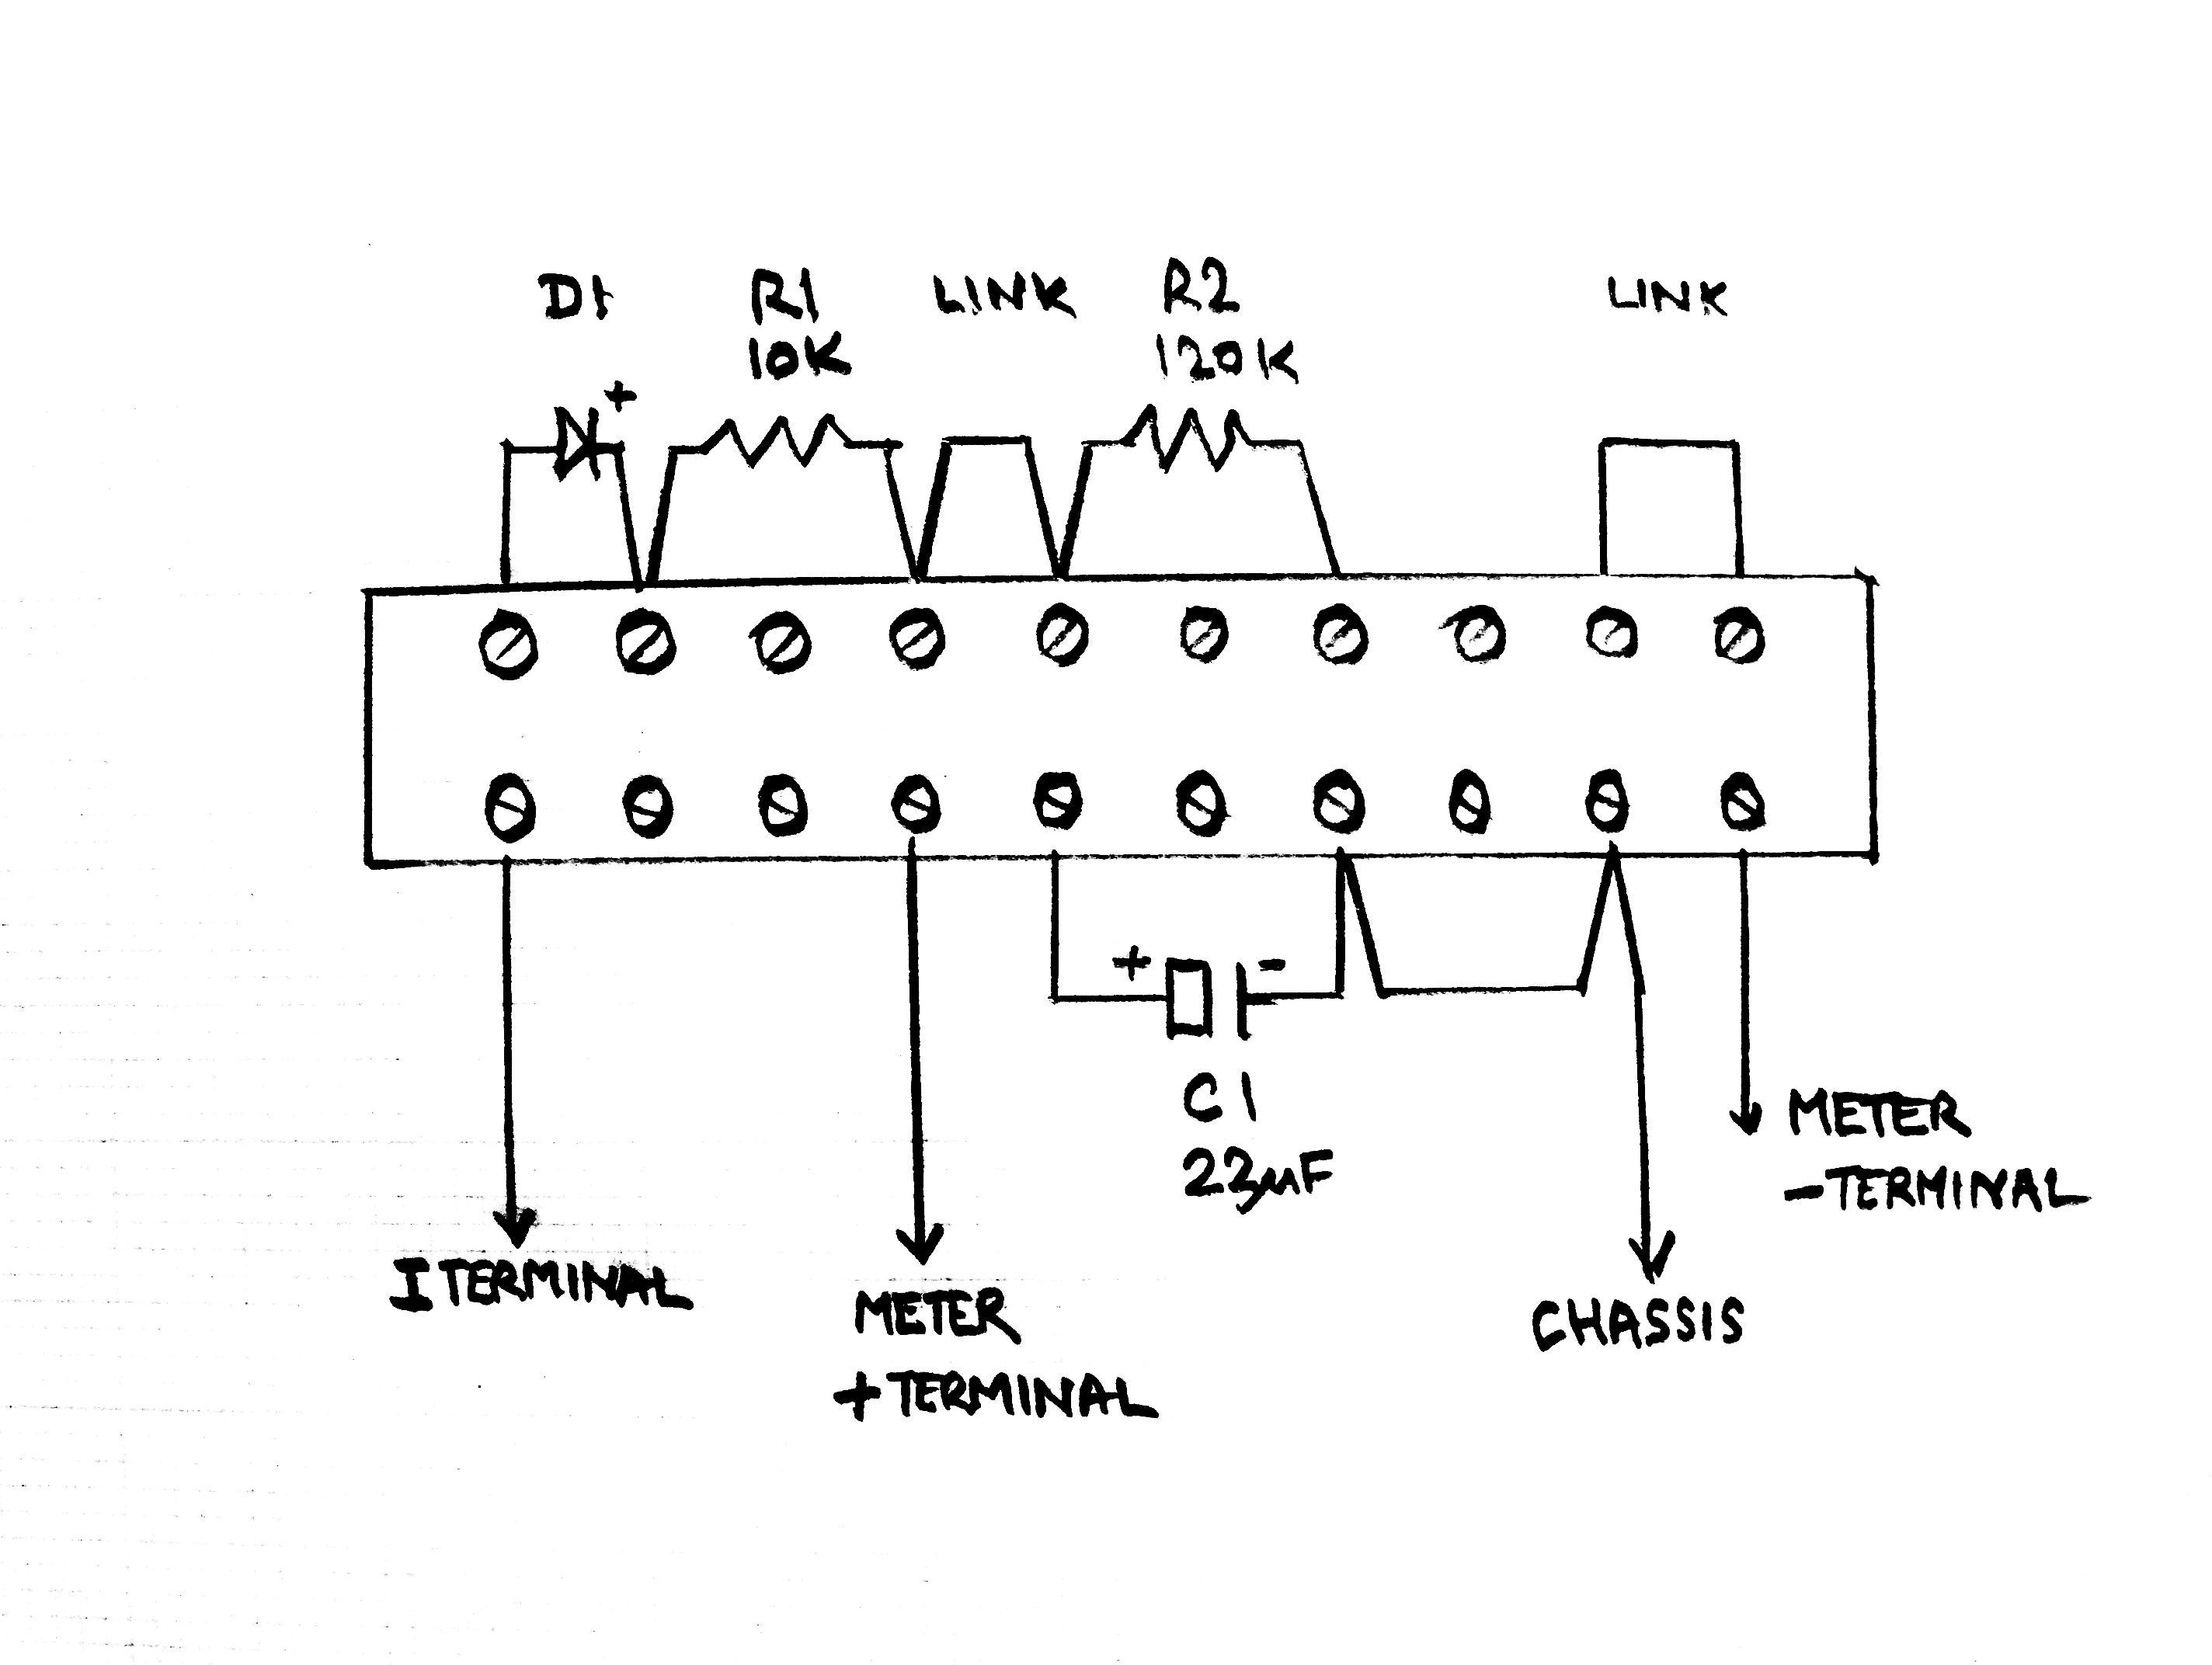 pic-test-circuit-block-ivs-edit-070716